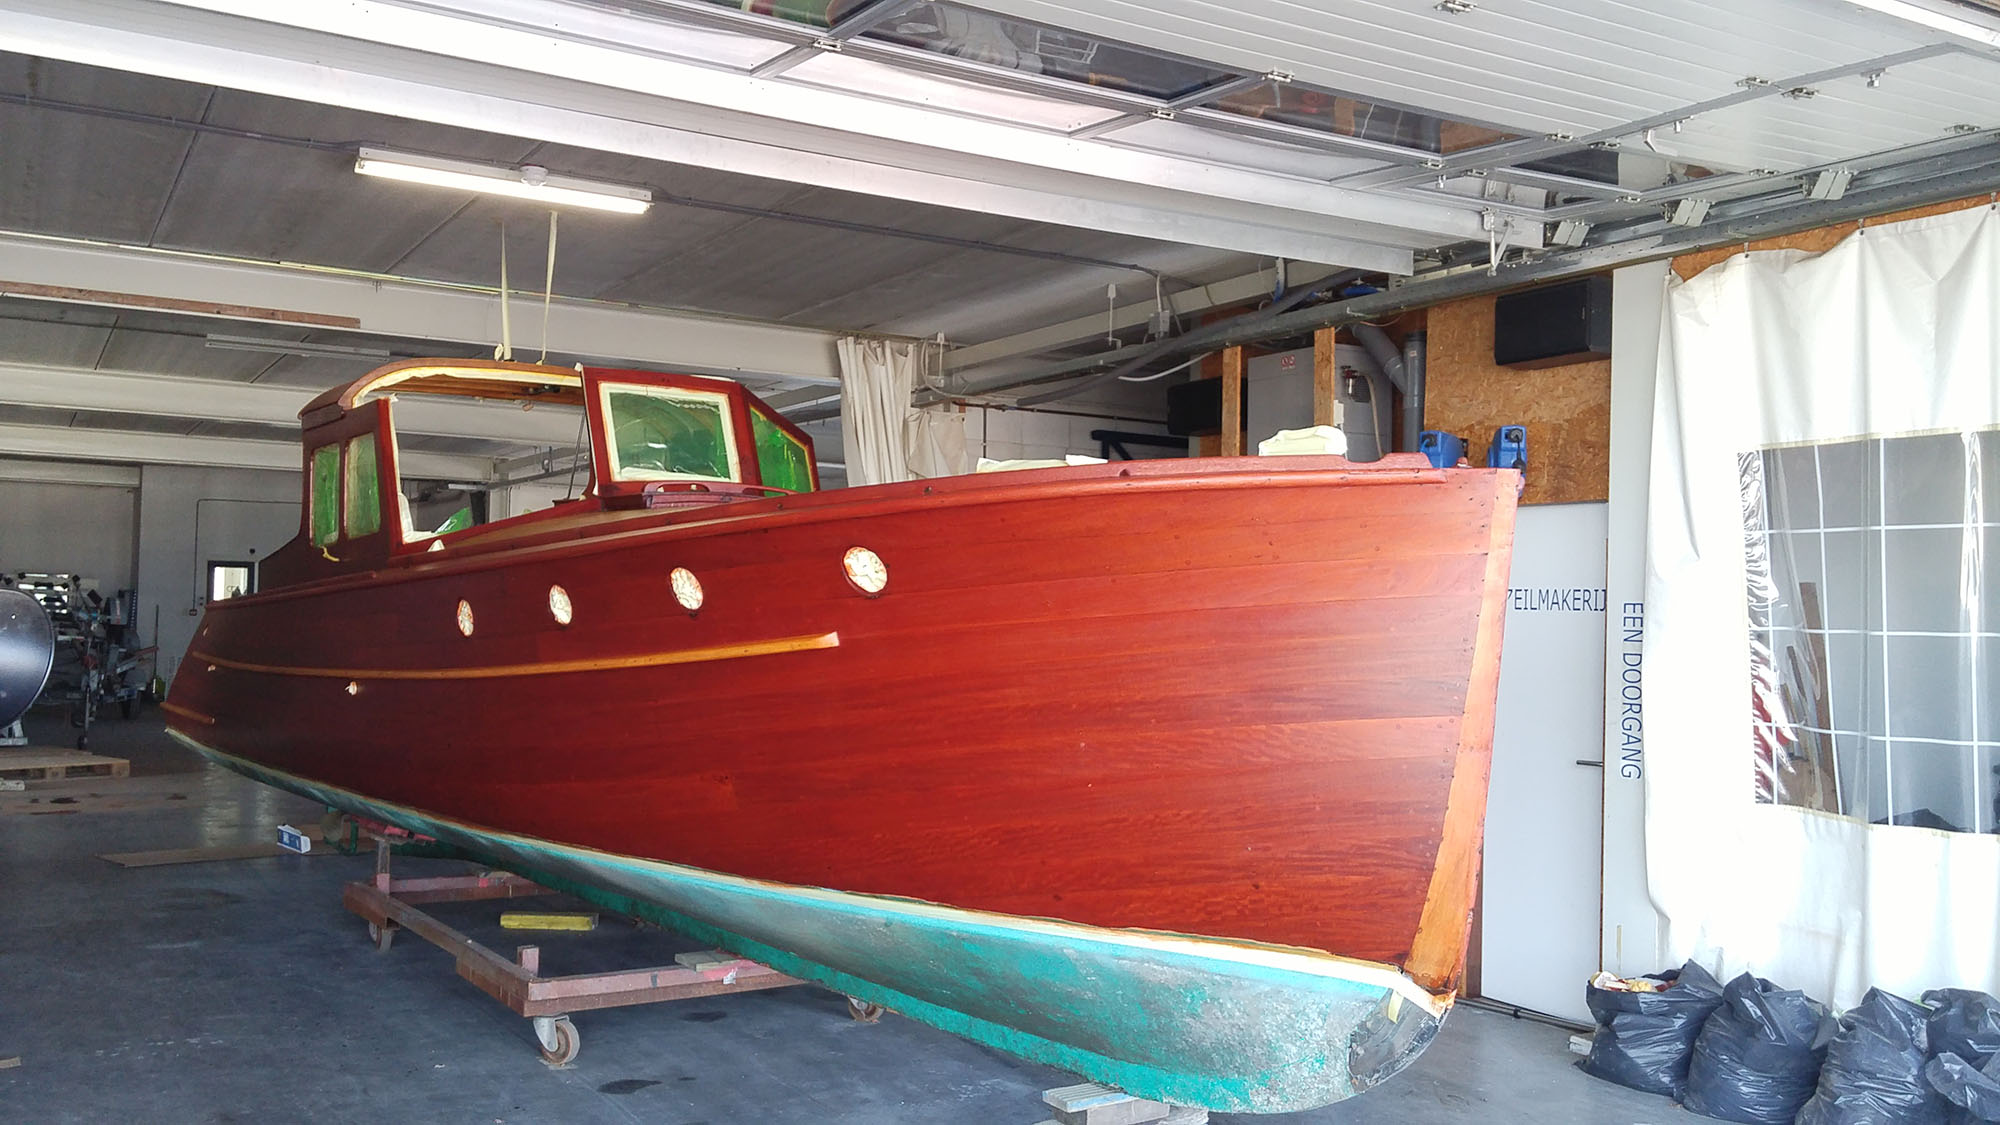 Jachtschilder Friesland-jacht-houten-boot-sloep-Coelan-bootlak-jachtlak-classic-design-yacht-painters2